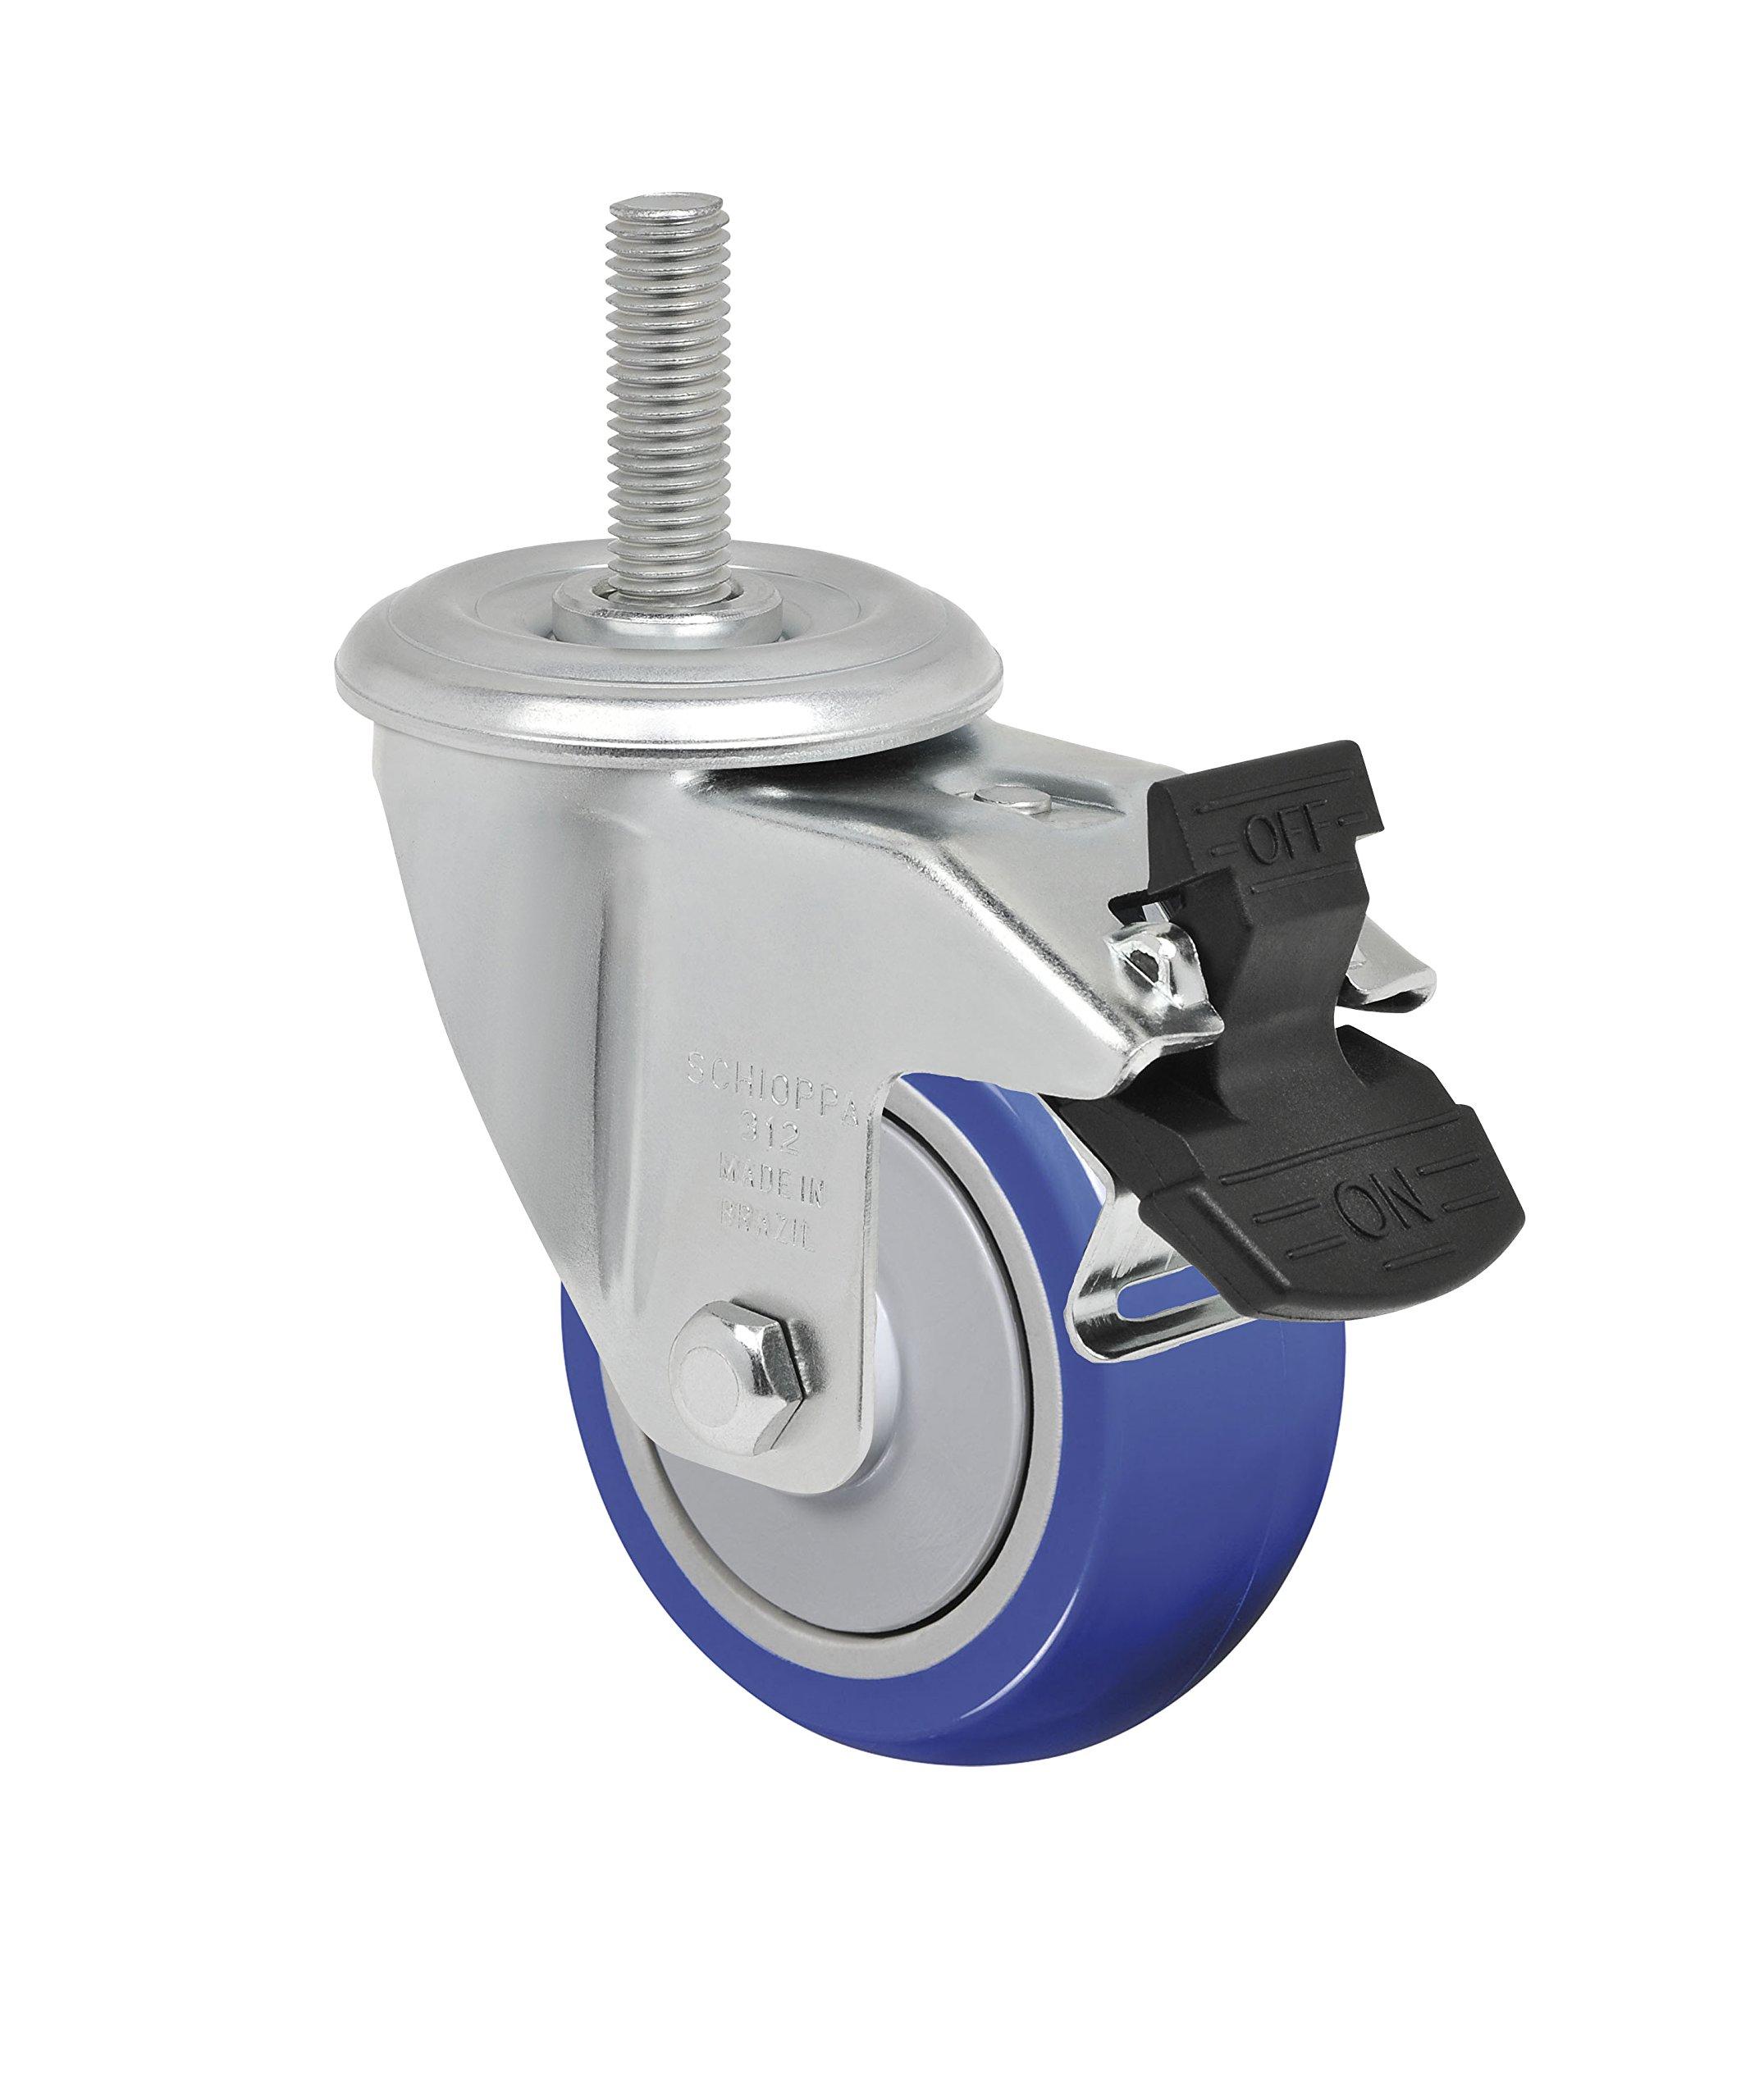 Schioppa L12 Series, GLEIH 312 TP G, 3 x 1-1/4'' Swivel Caster with Total Lock Brake, Non-Marking Thermoplastic Compound Wheel, 150 lbs, 1/2'' Diameter x 2'' Length Threaded Stem